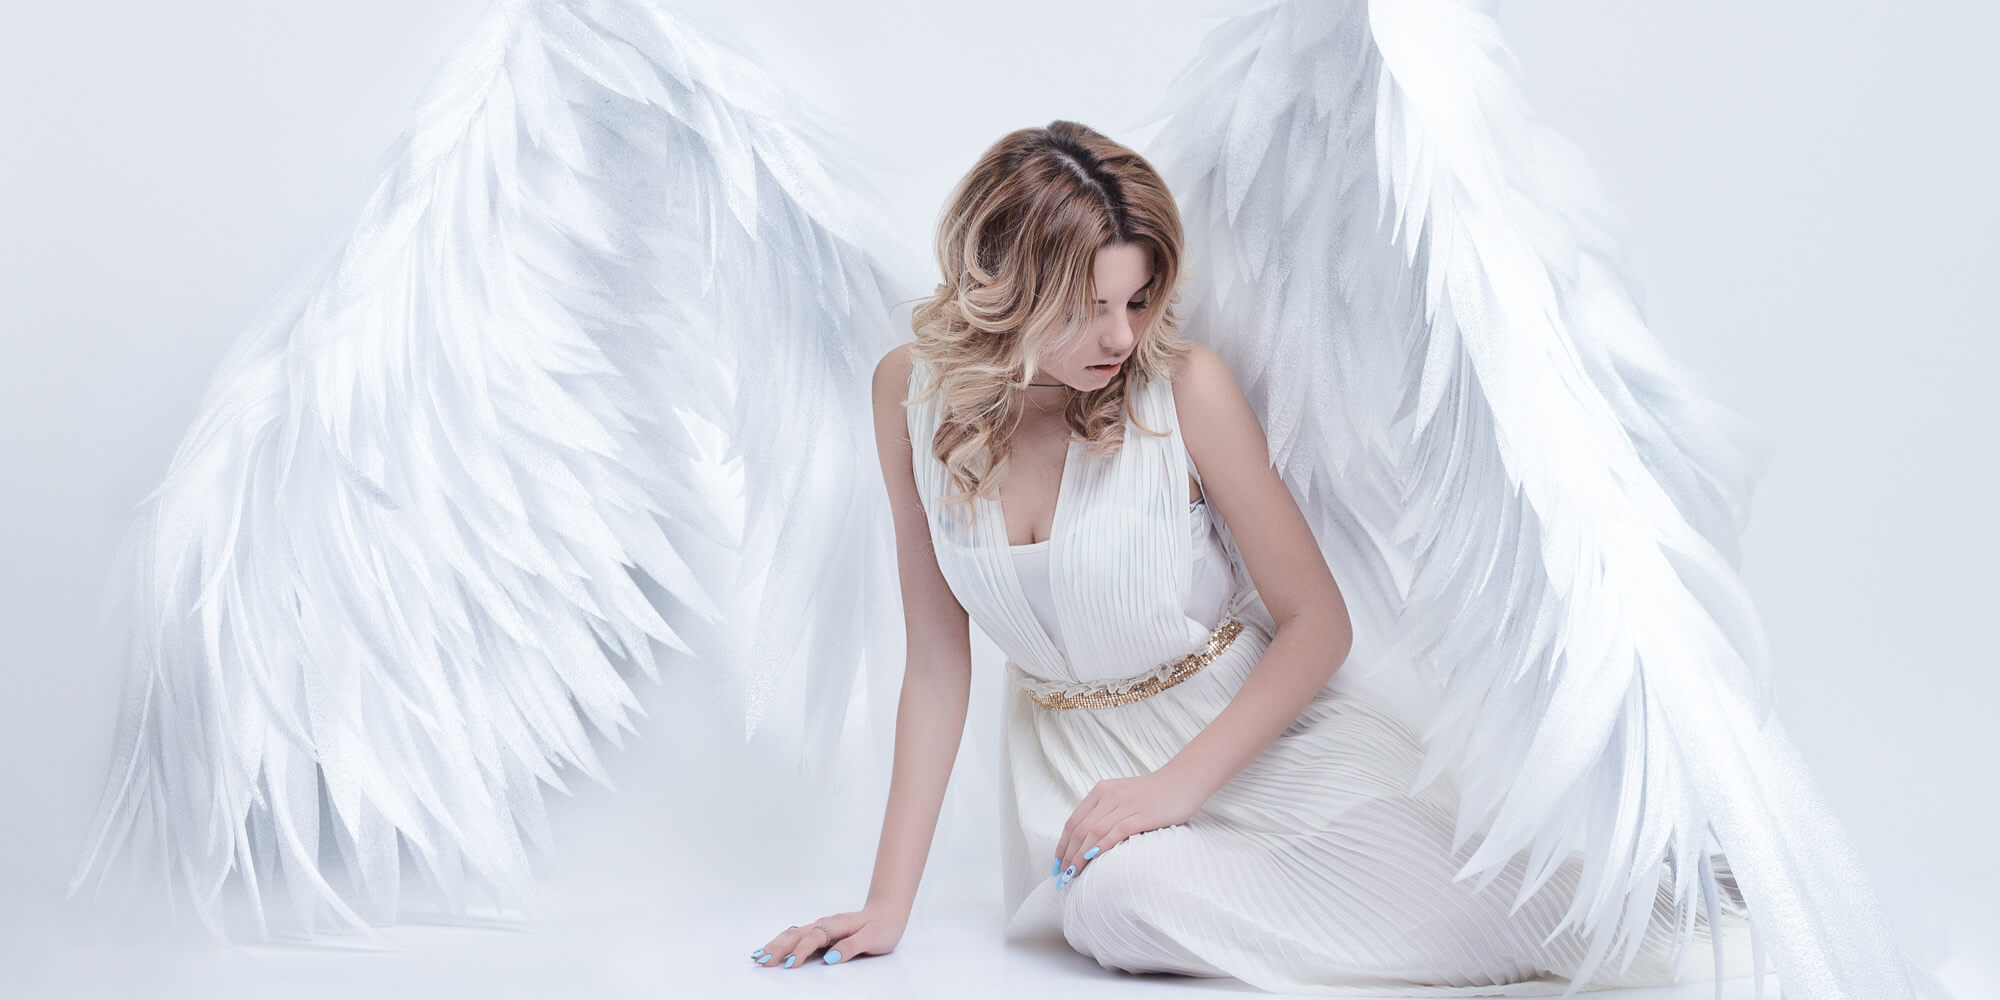 Guardian angel guide